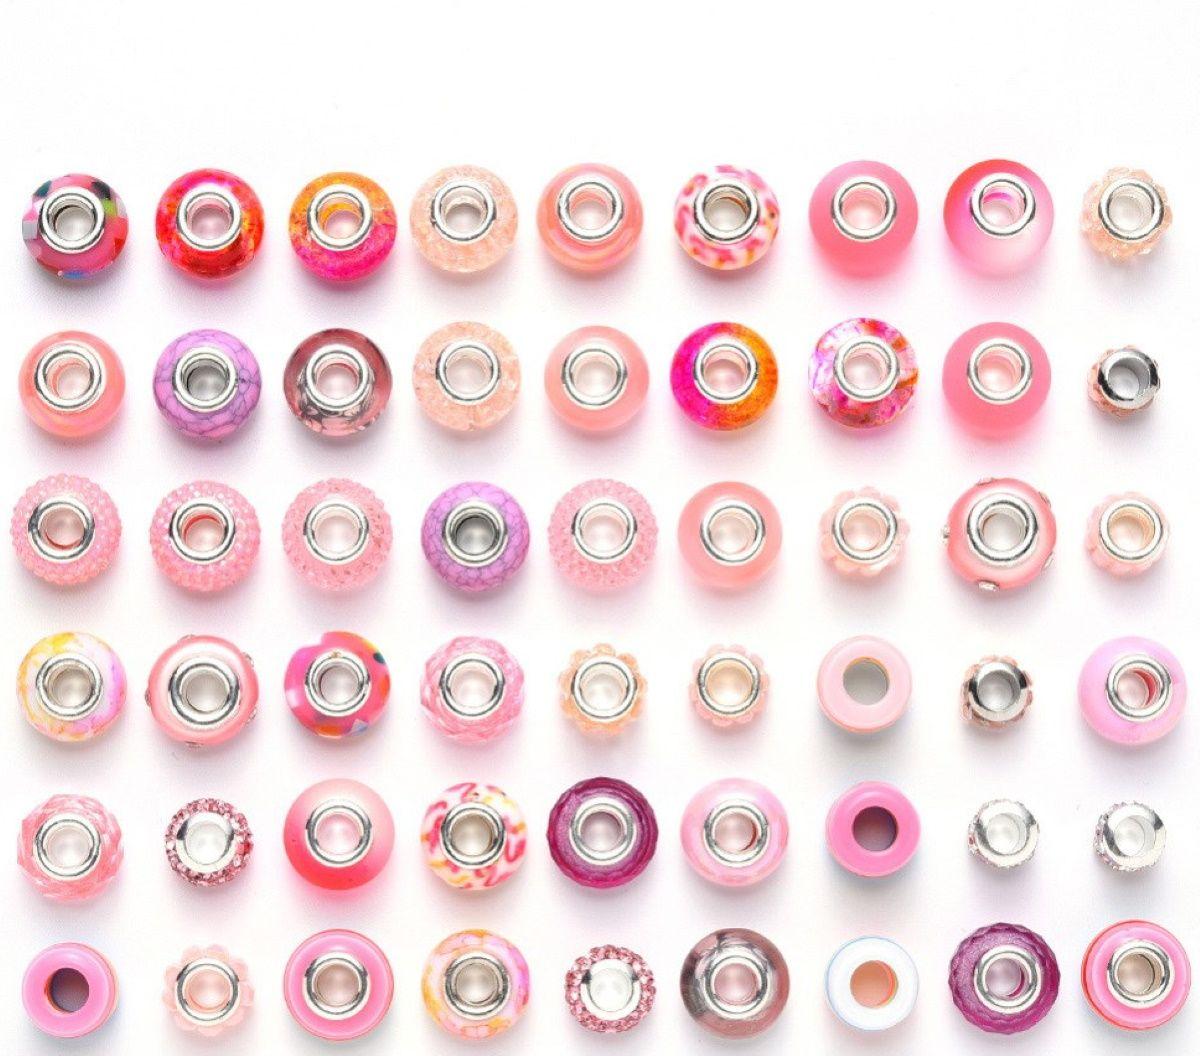 Charm Perlen Set, 50 Stück, Farbe wählbar